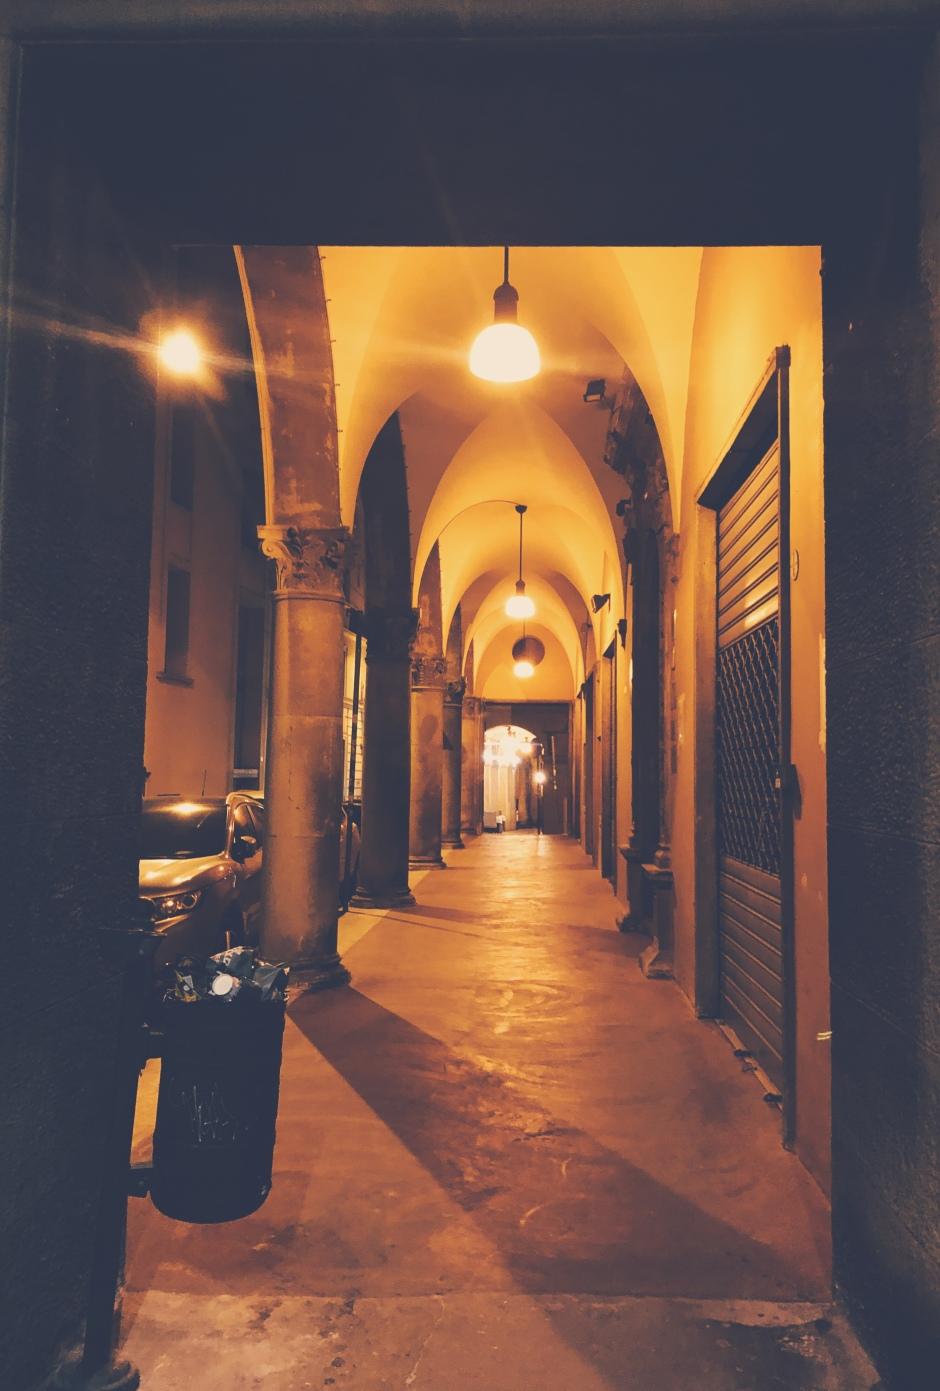 Porticoes in Bologna Italy